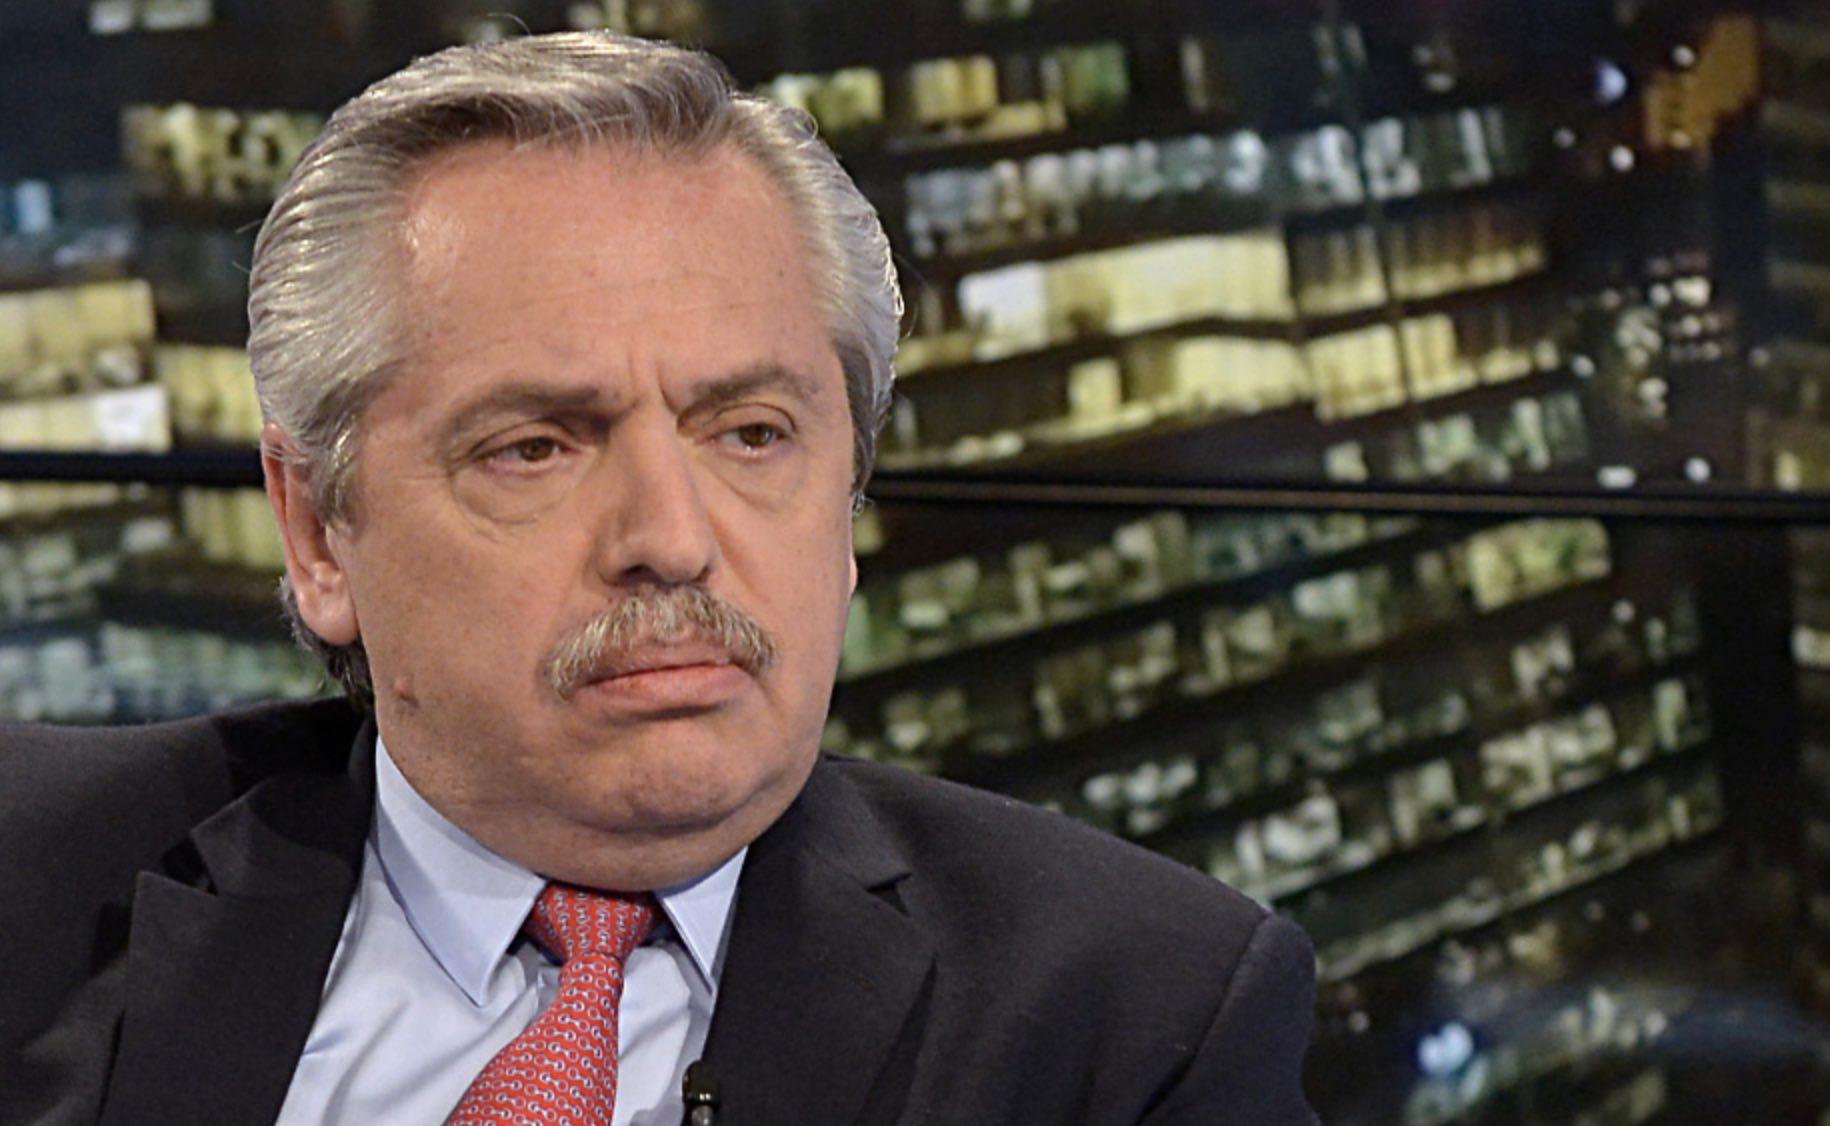 Alberto Fernández, Kirchnerismo, Frente de Todos